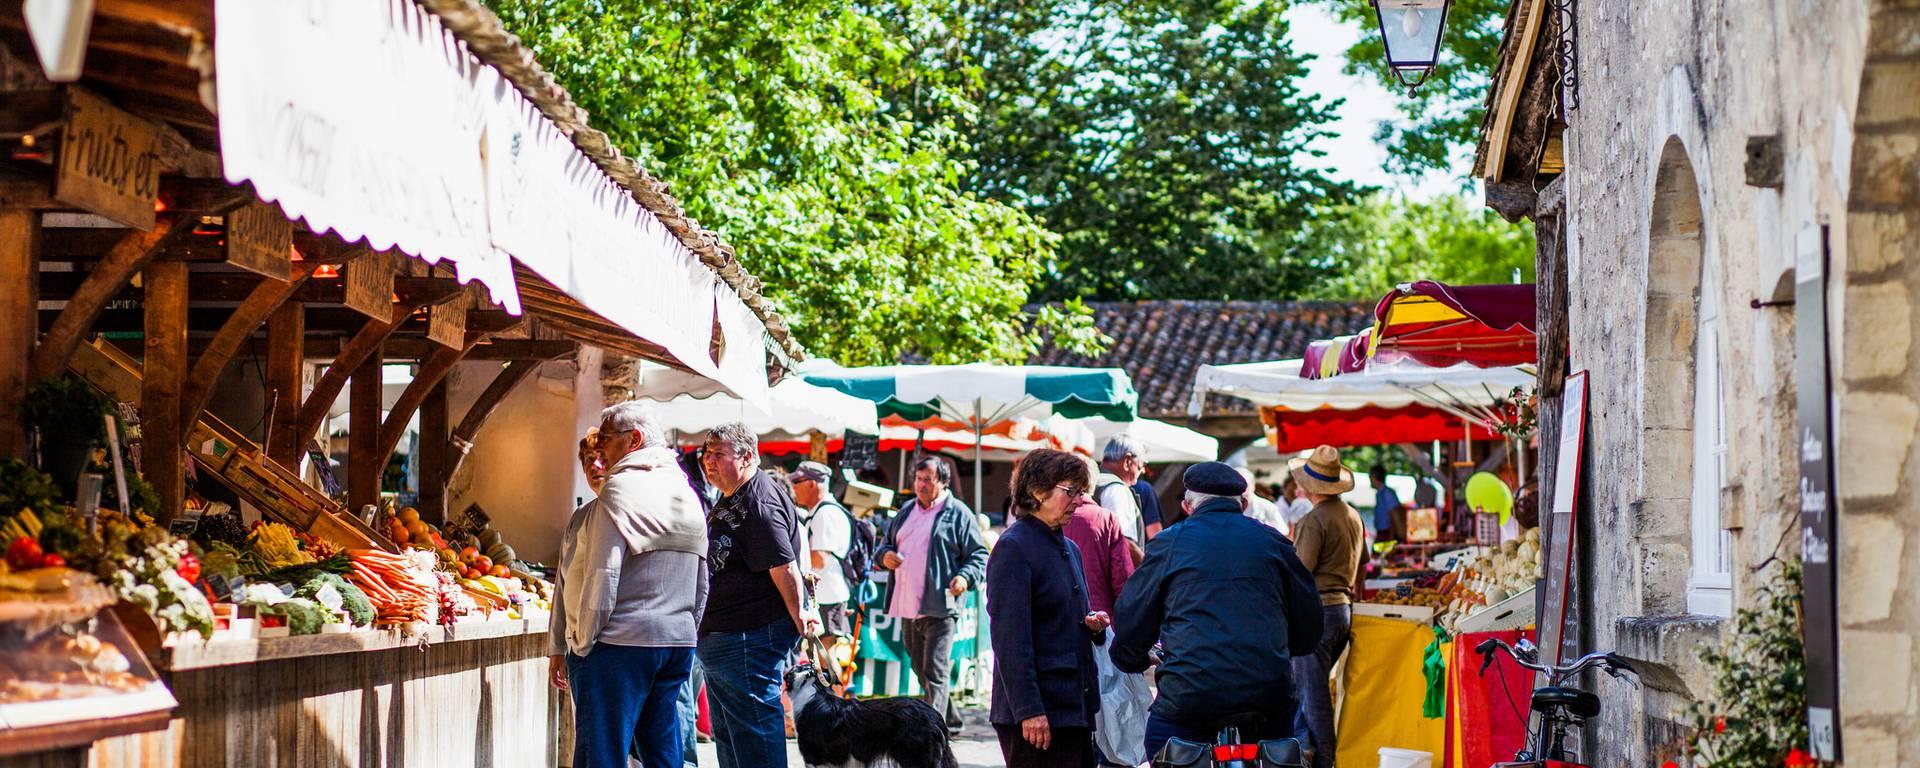 Market of La Flotte